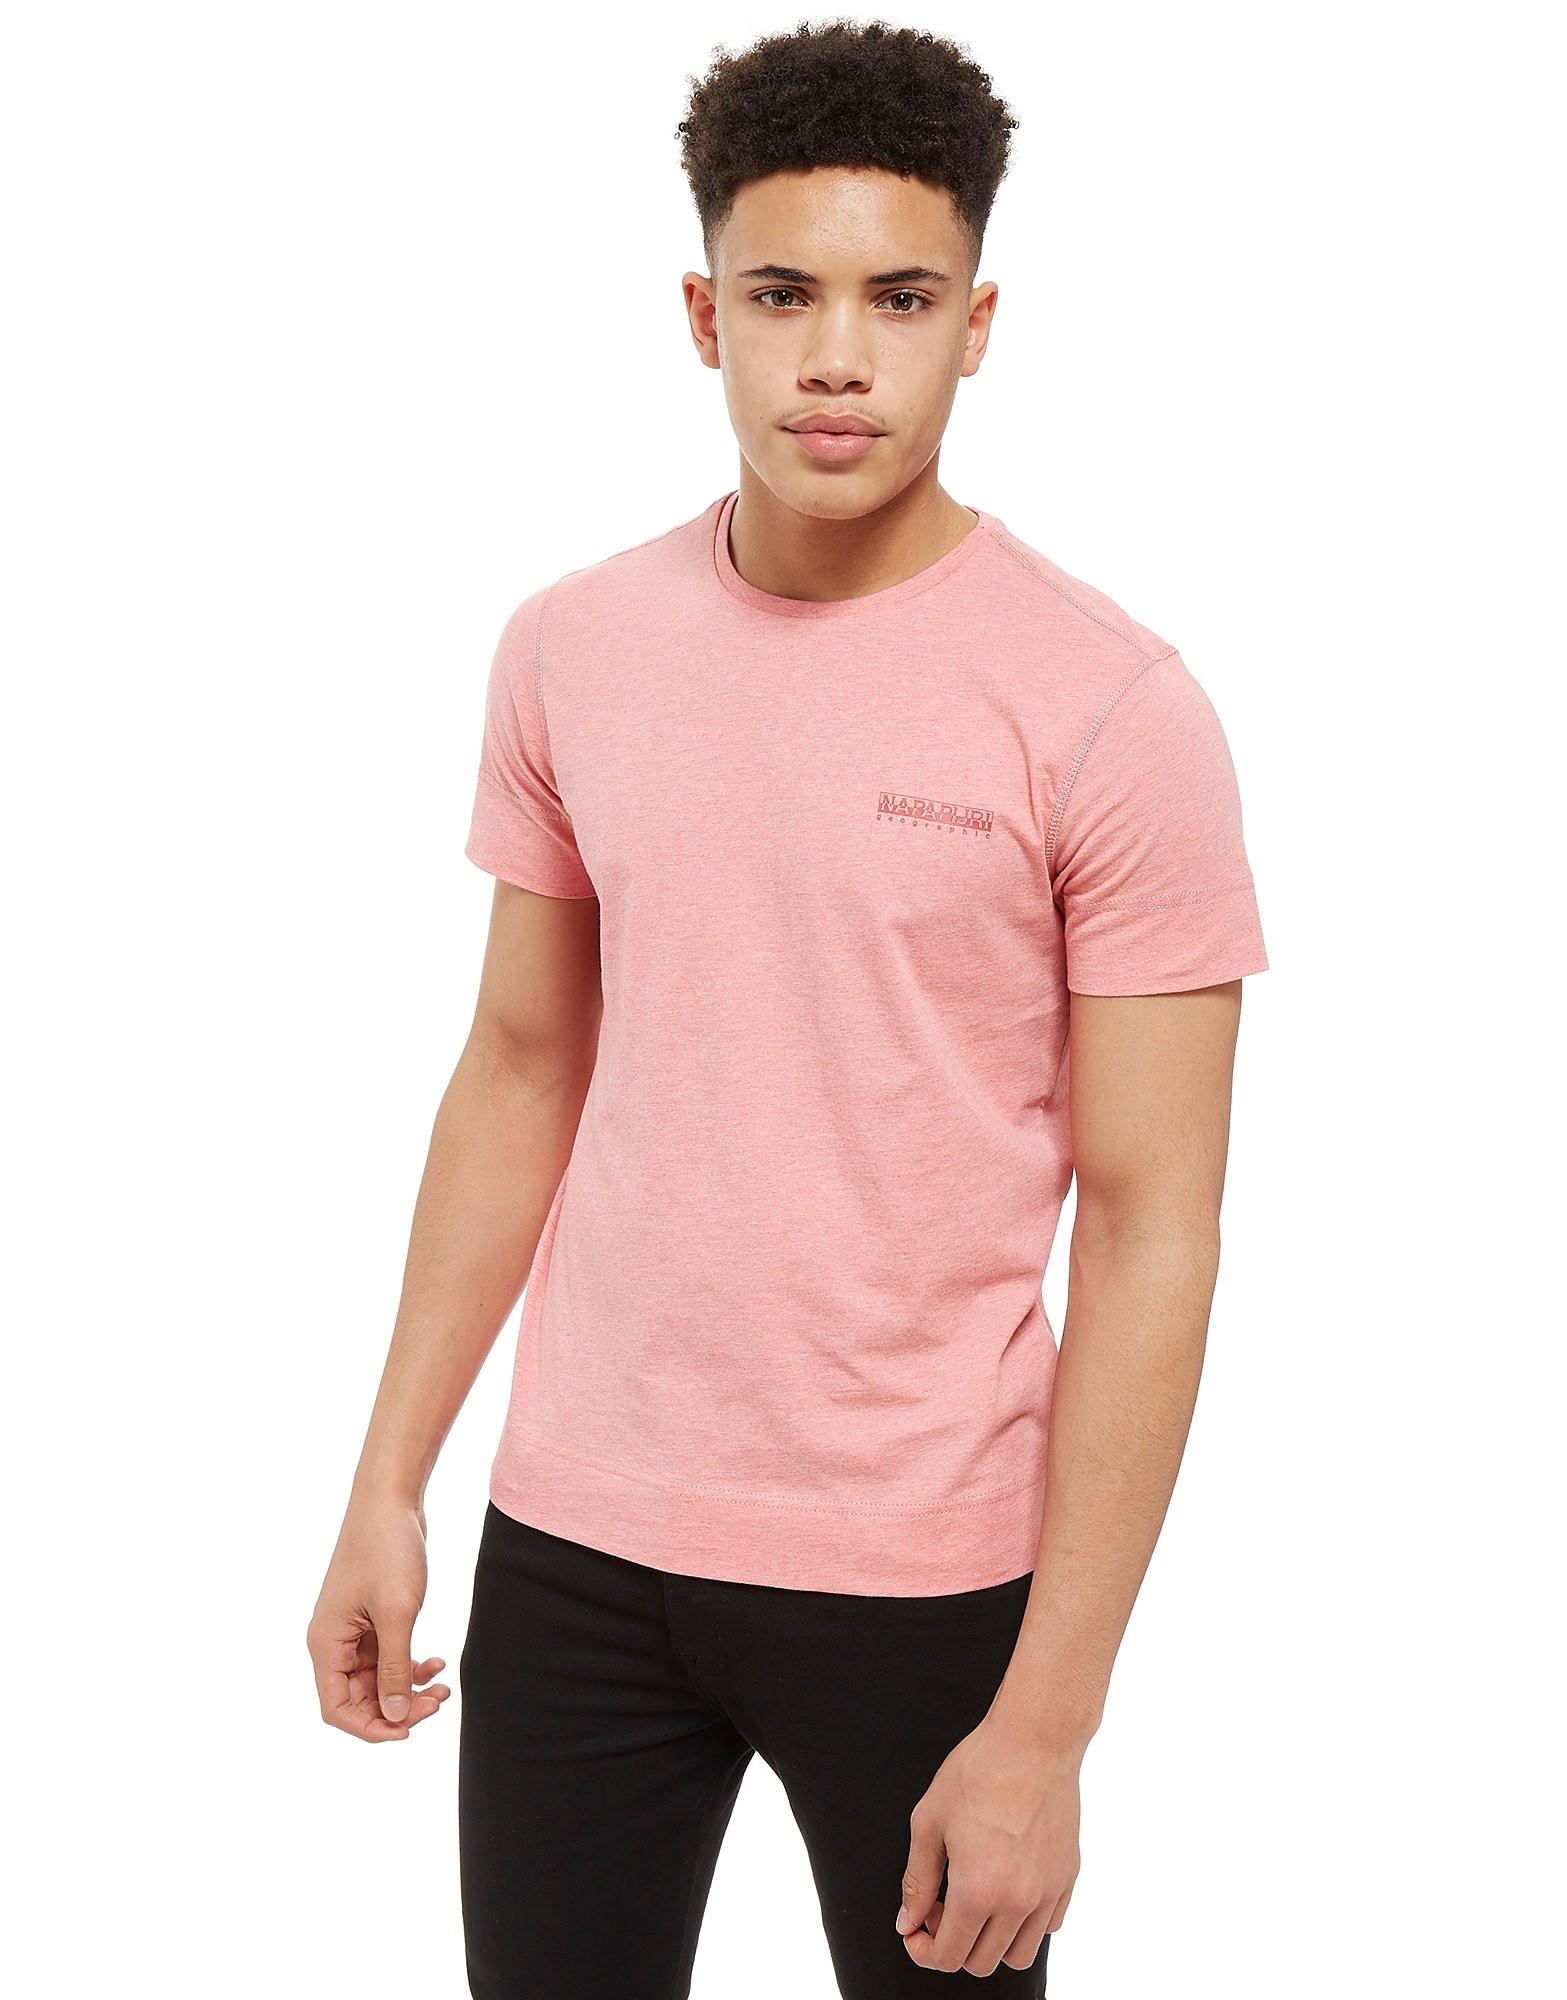 Napapijri Short Sleeve Shew T-Shirt